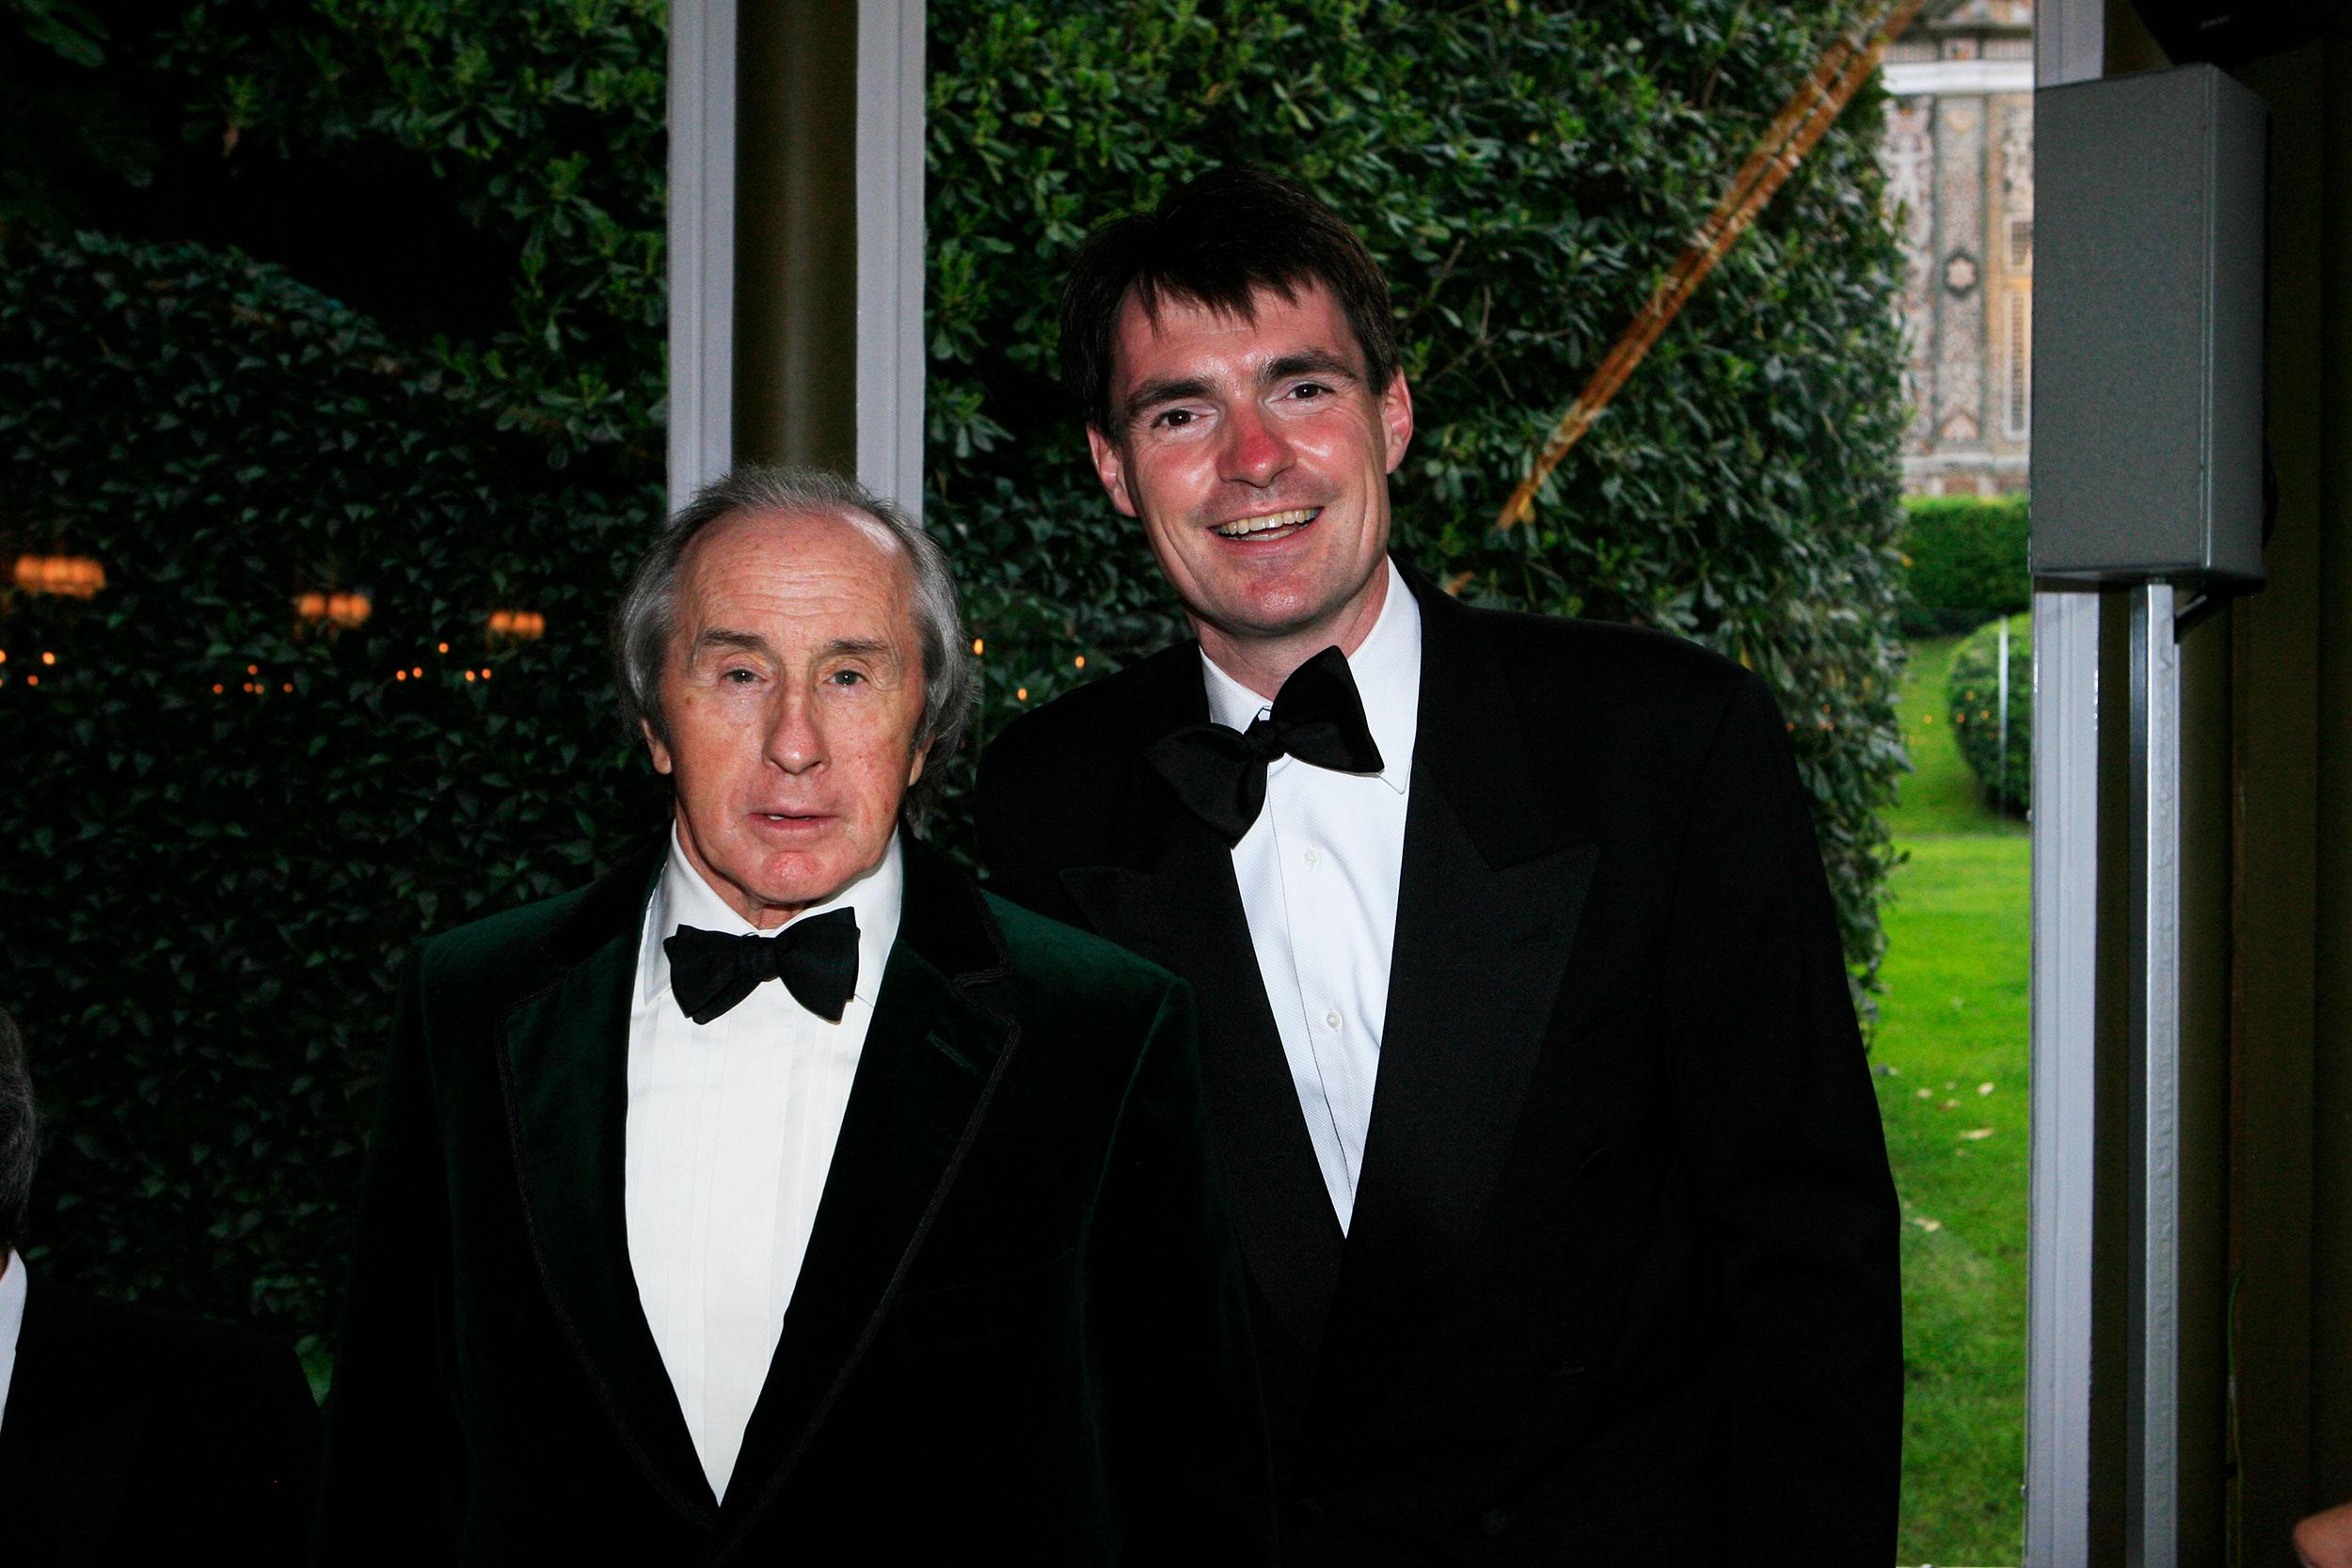 Sir Jackie Stewart at Villa d'Este with Cruise to Se7en founder Leon Beenen